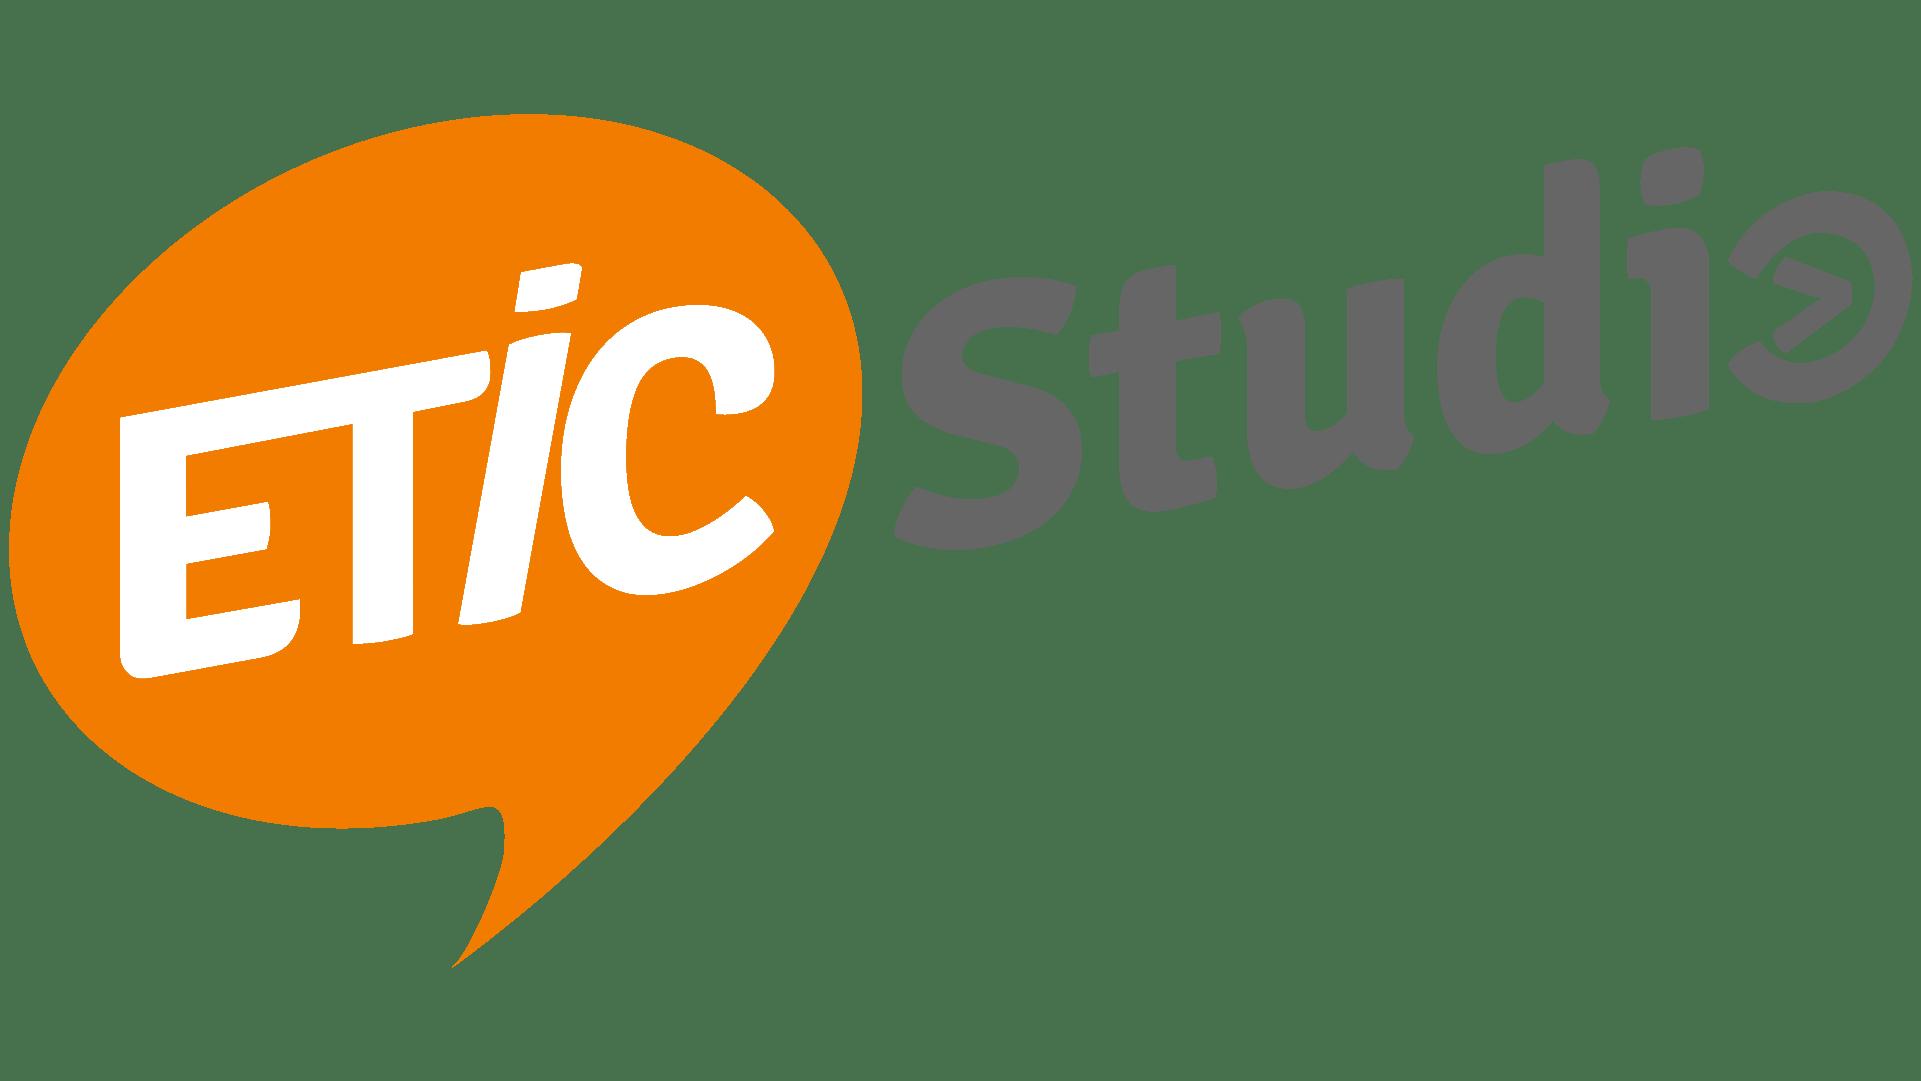 Agence Etic-studio